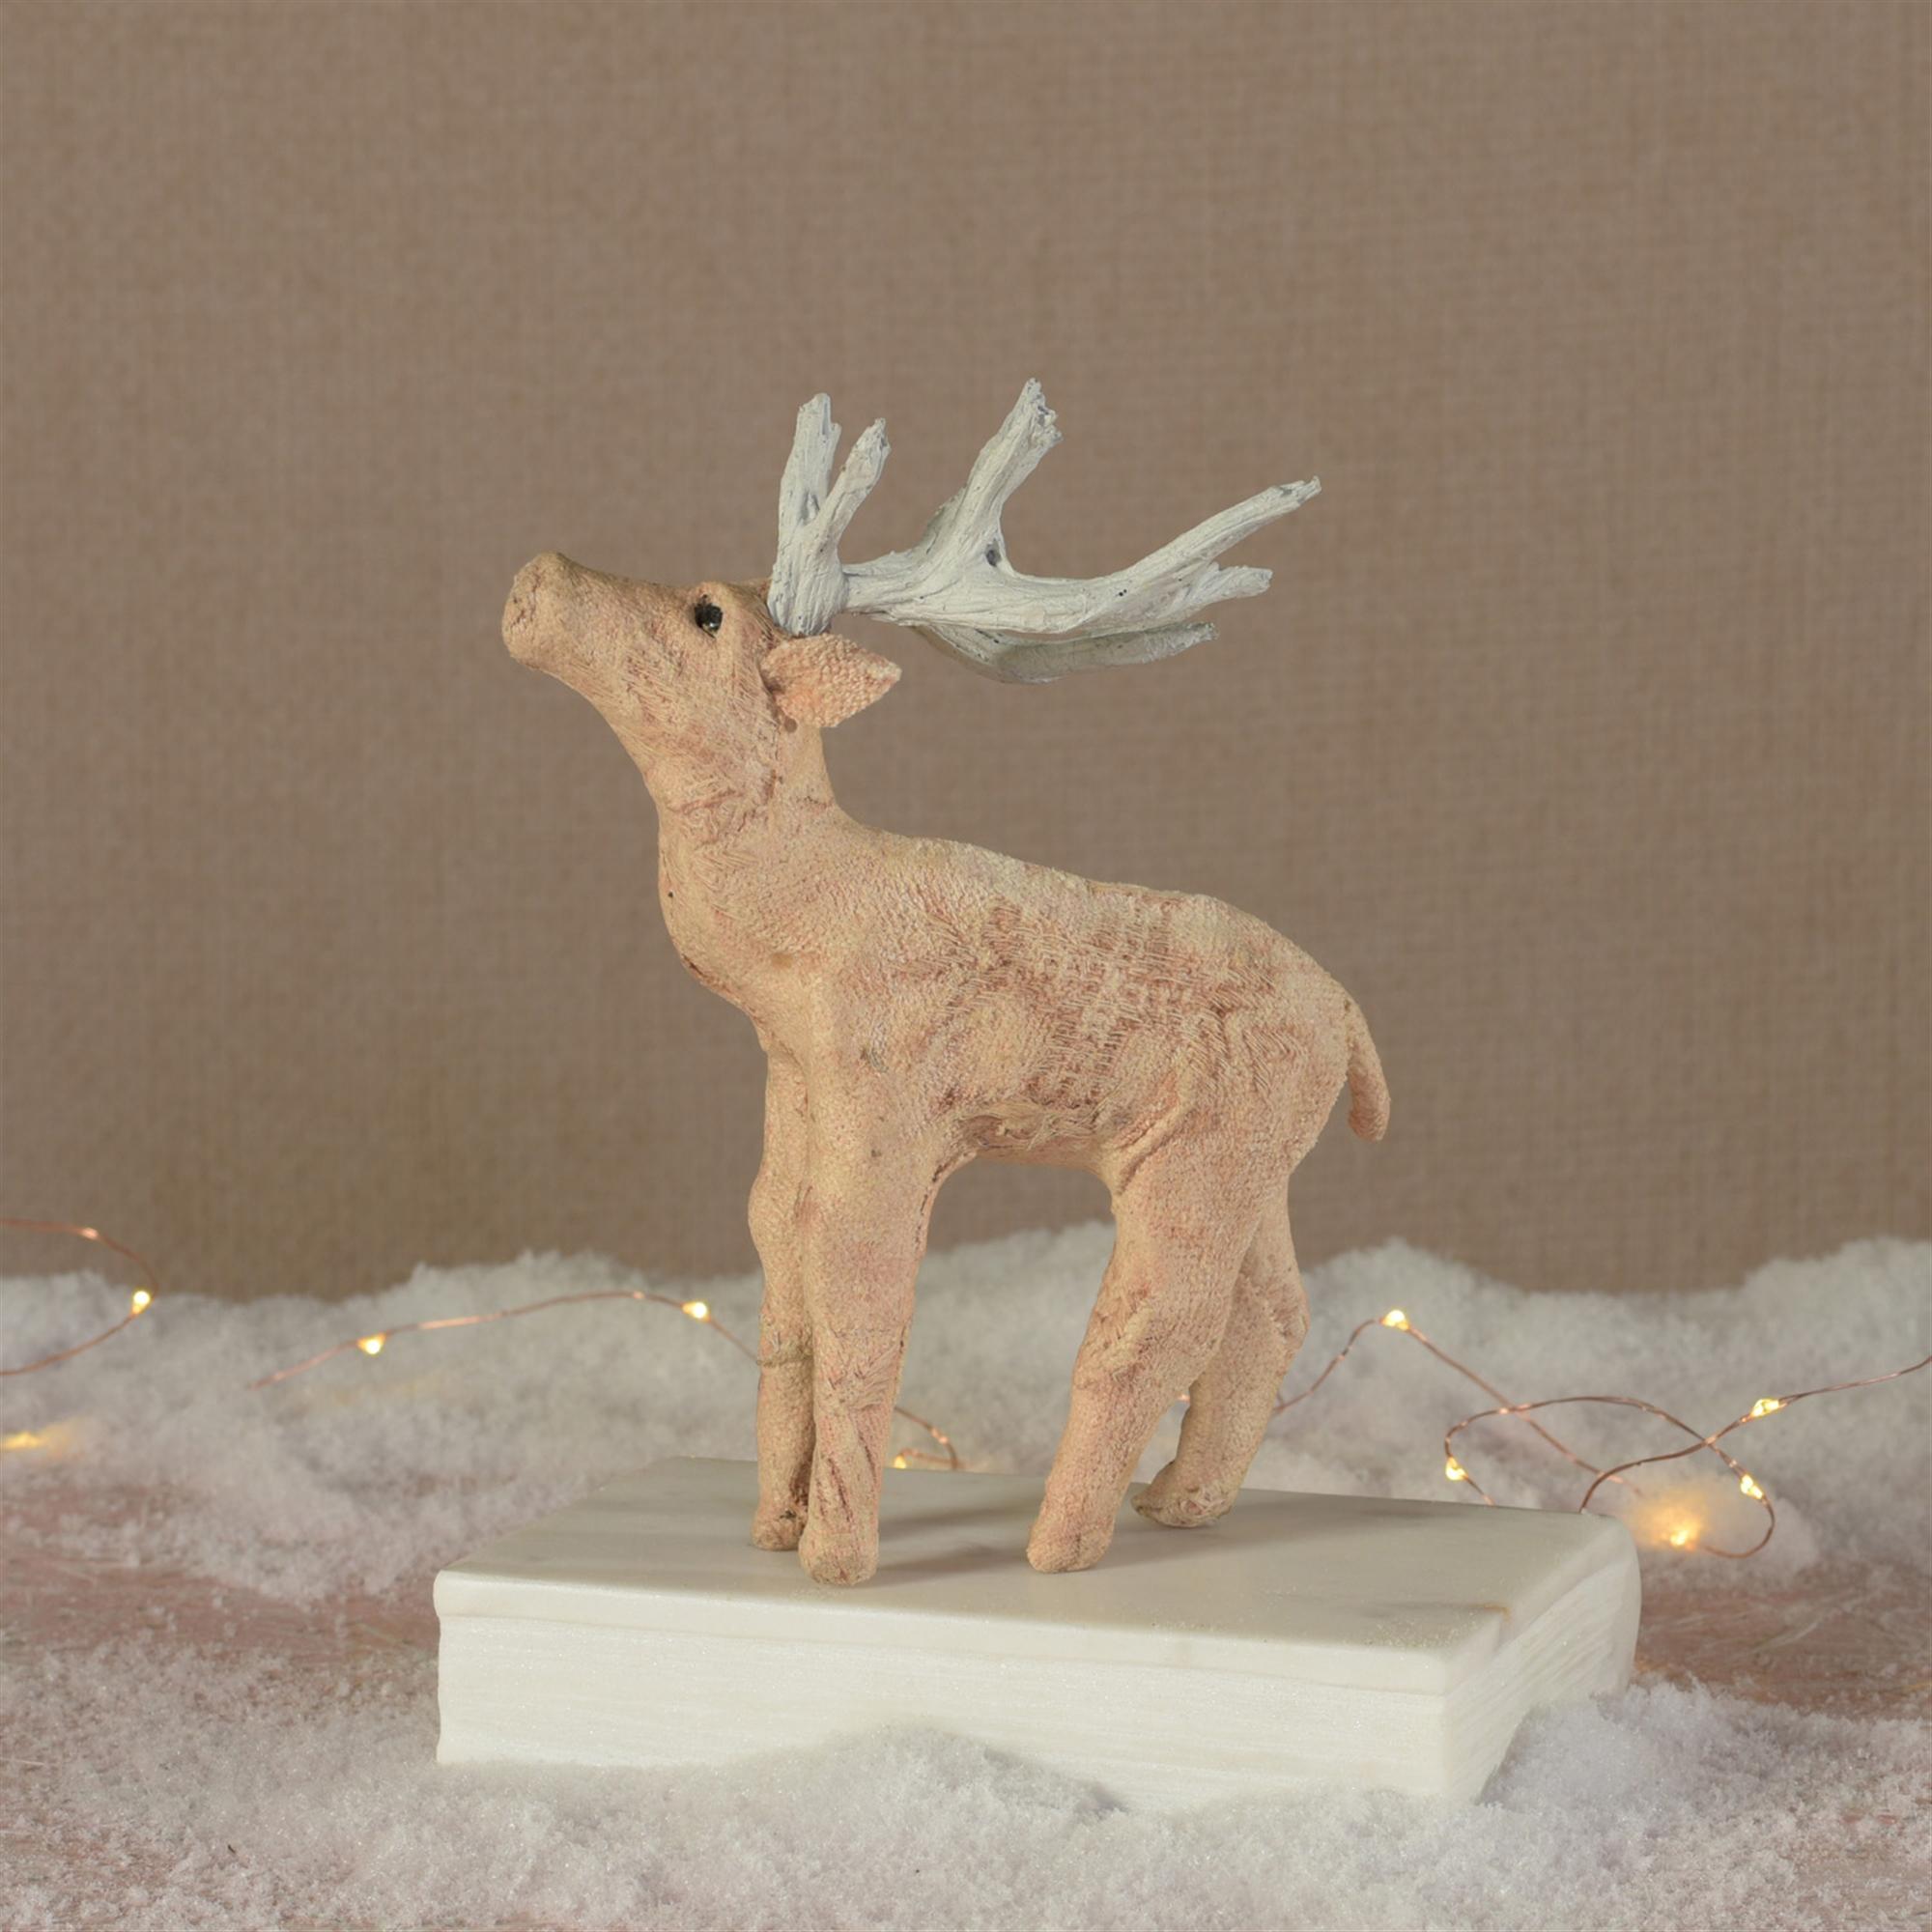 9403-16 - Blush Stag Standing - Petite - Stonewashed Pink by HomArt